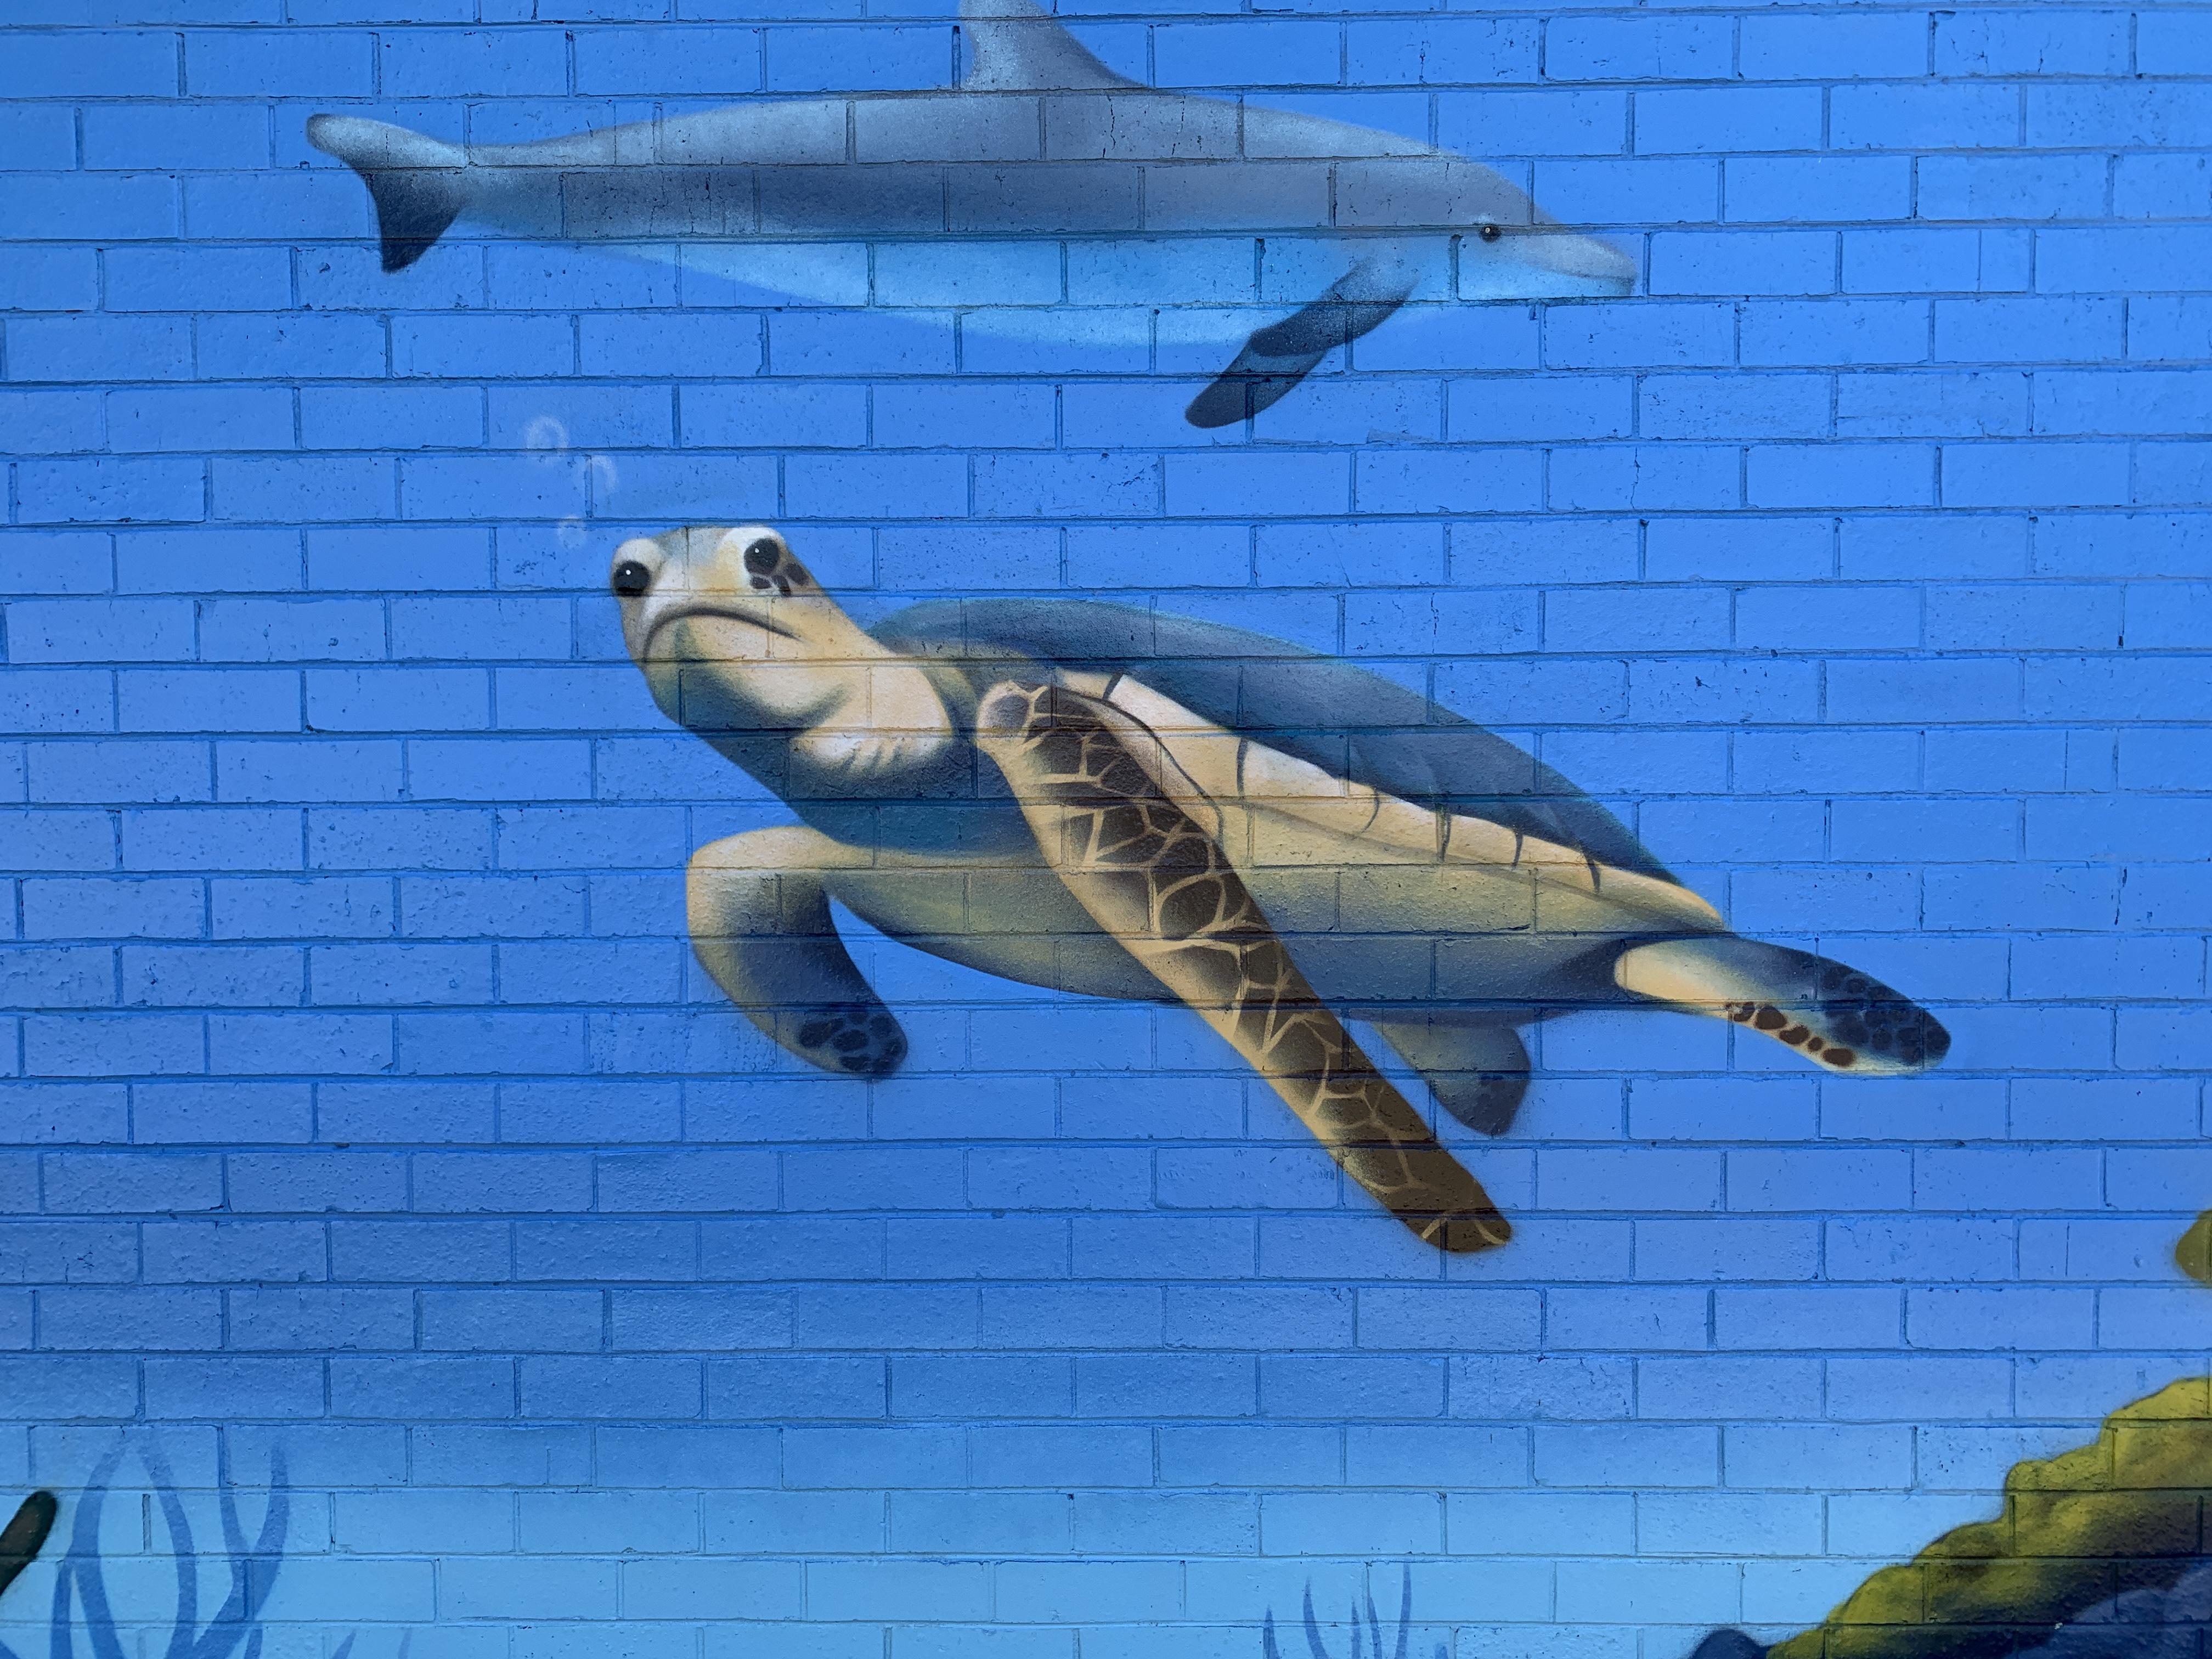 Turtle mural art by Urban Art